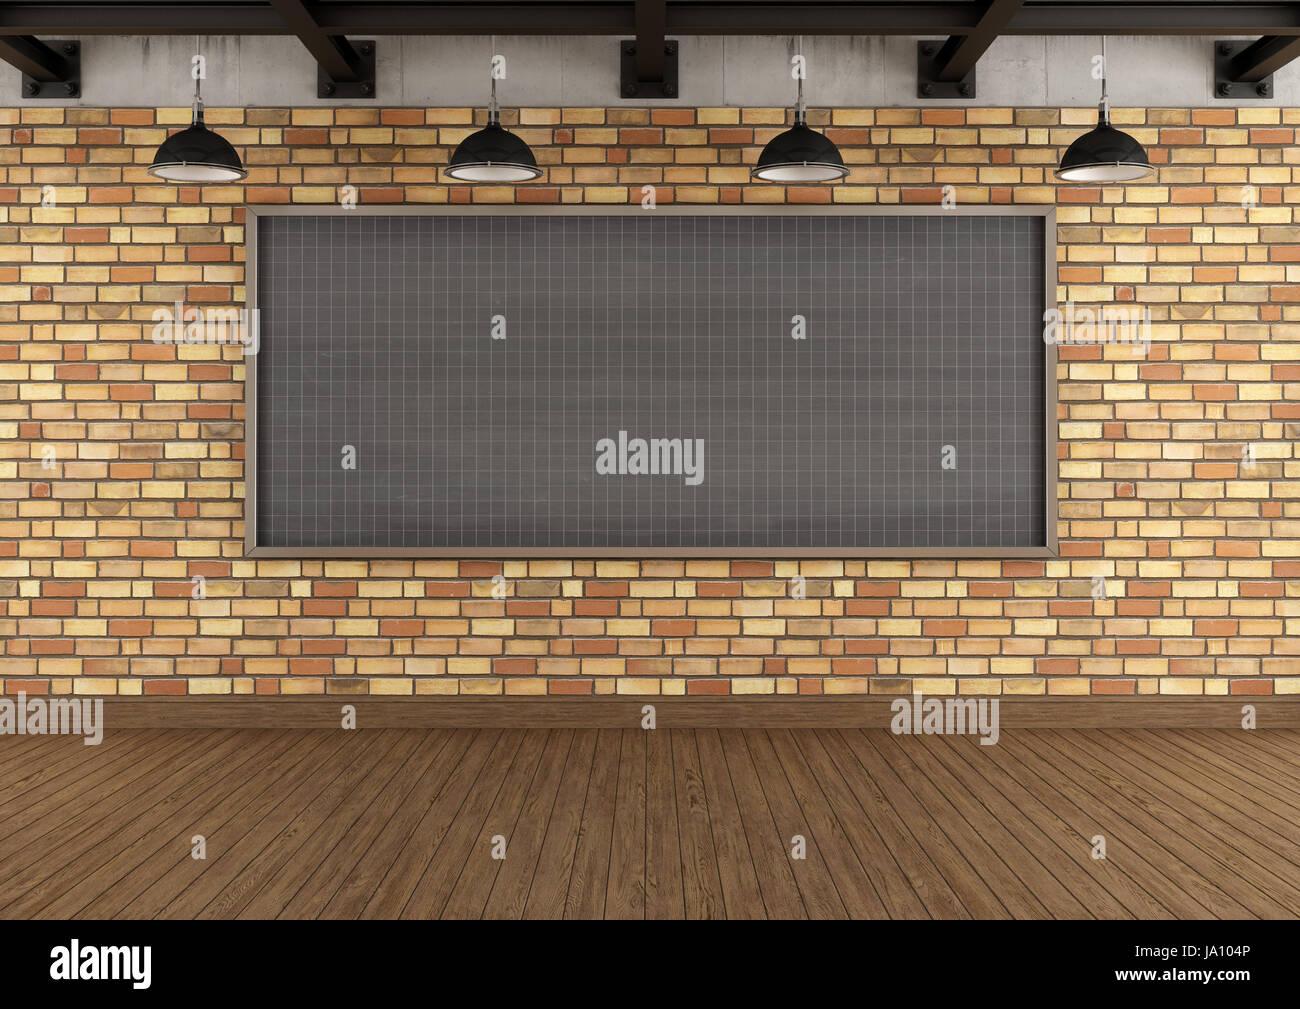 Loft Brick Wall Concrete Beams Stockfotos & Loft Brick Wall Concrete ...